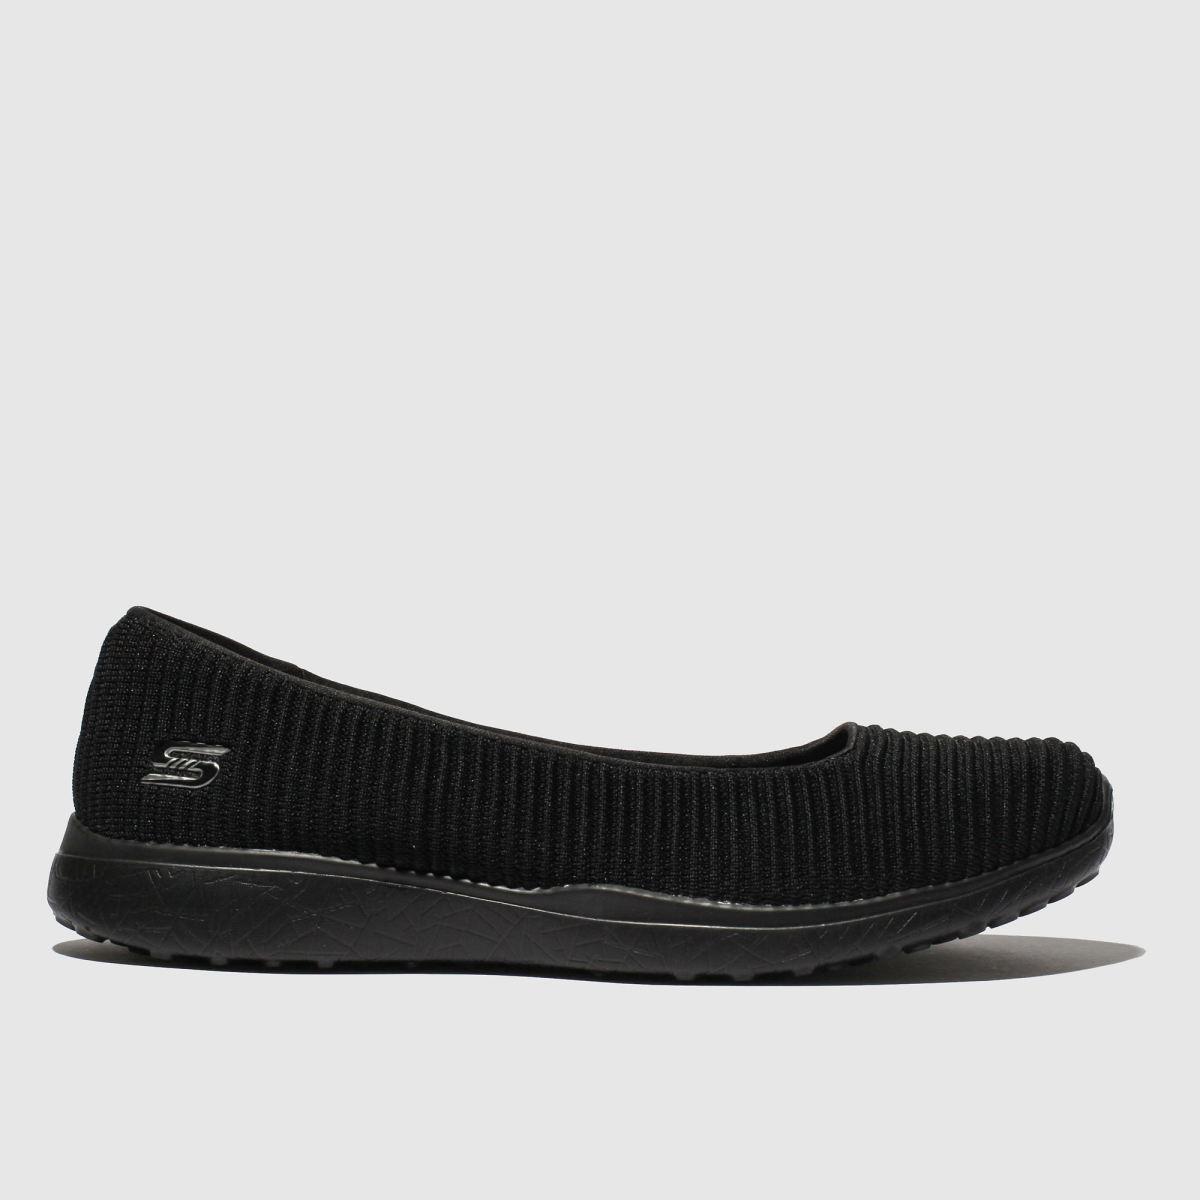 Skechers Black Microburst Trainers